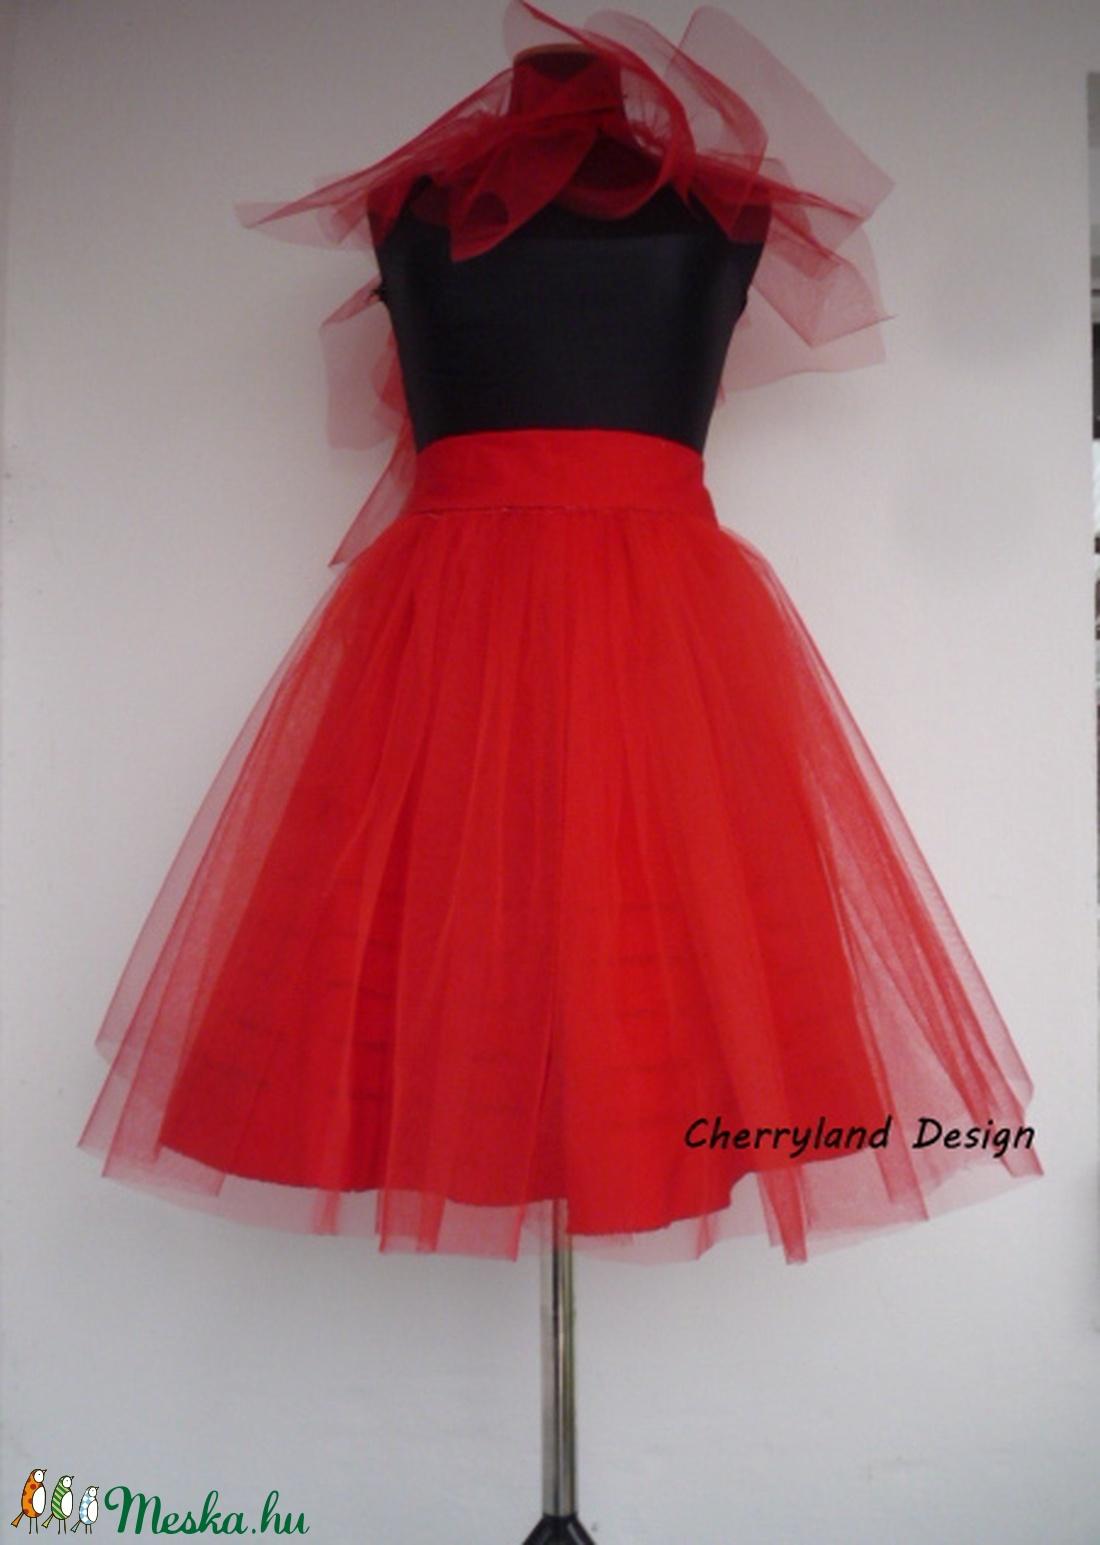 6e85340cec Cherryland Design Mennyecske Piros Tüll Szoknya/ Red Tulle skirt